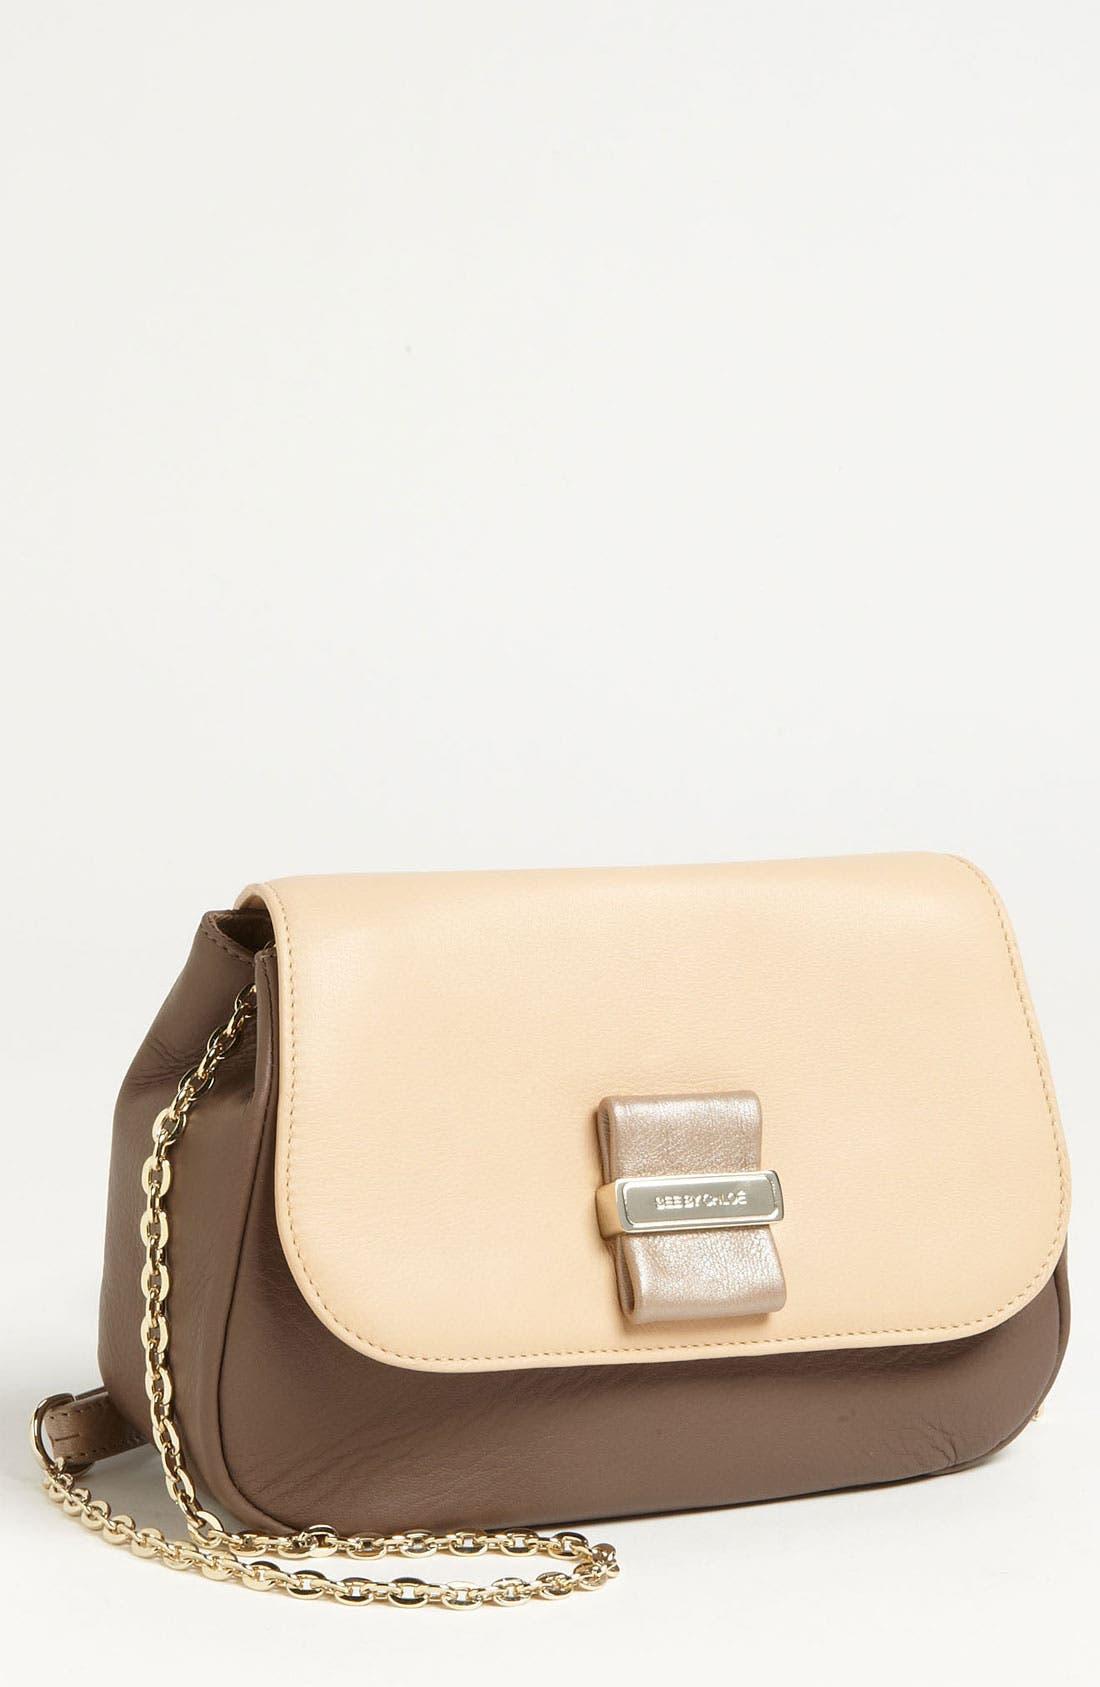 Main Image - See by Chloé 'Rosita' Crossbody Bag